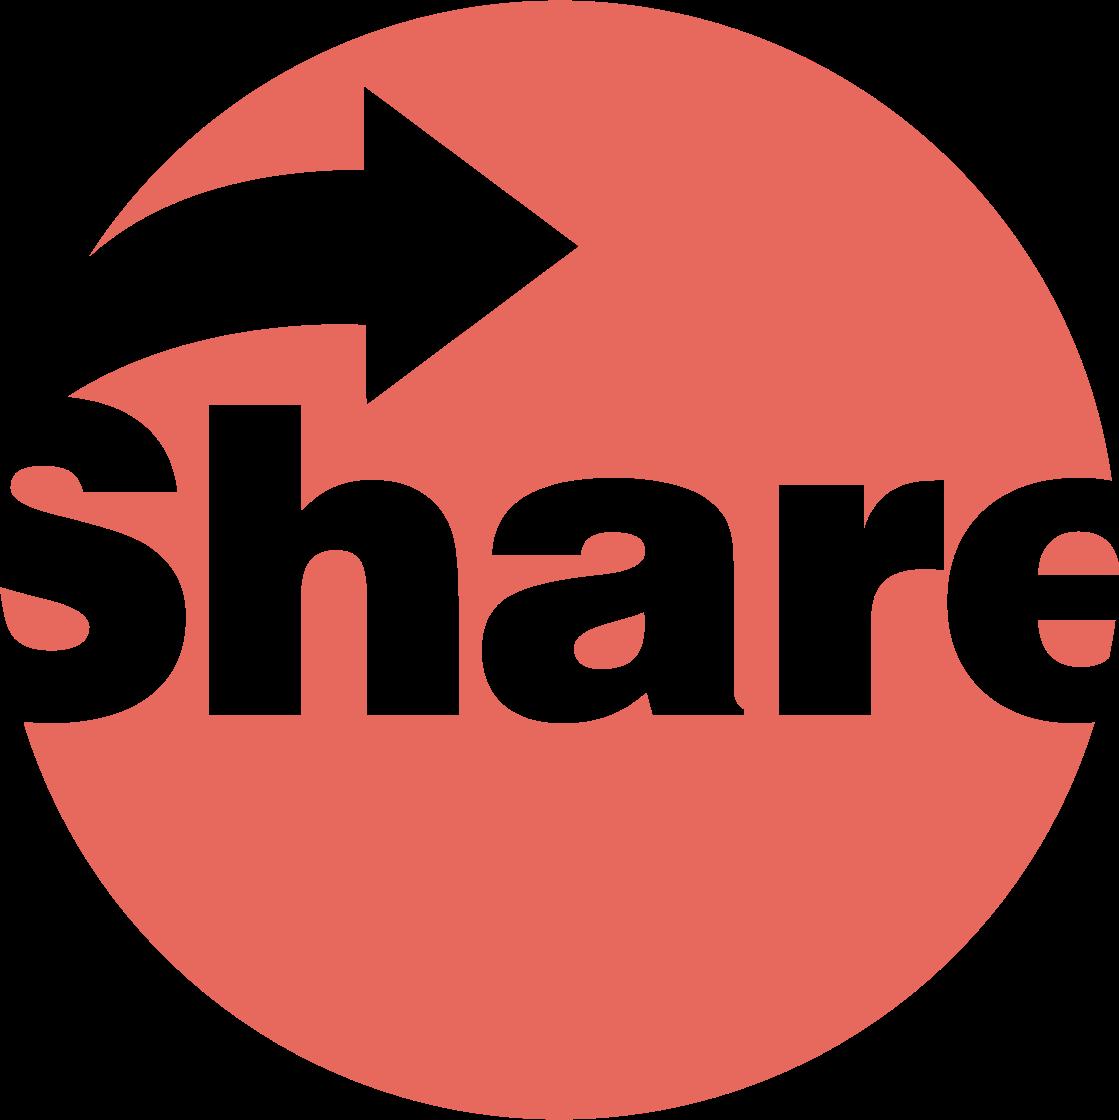 Share Button.